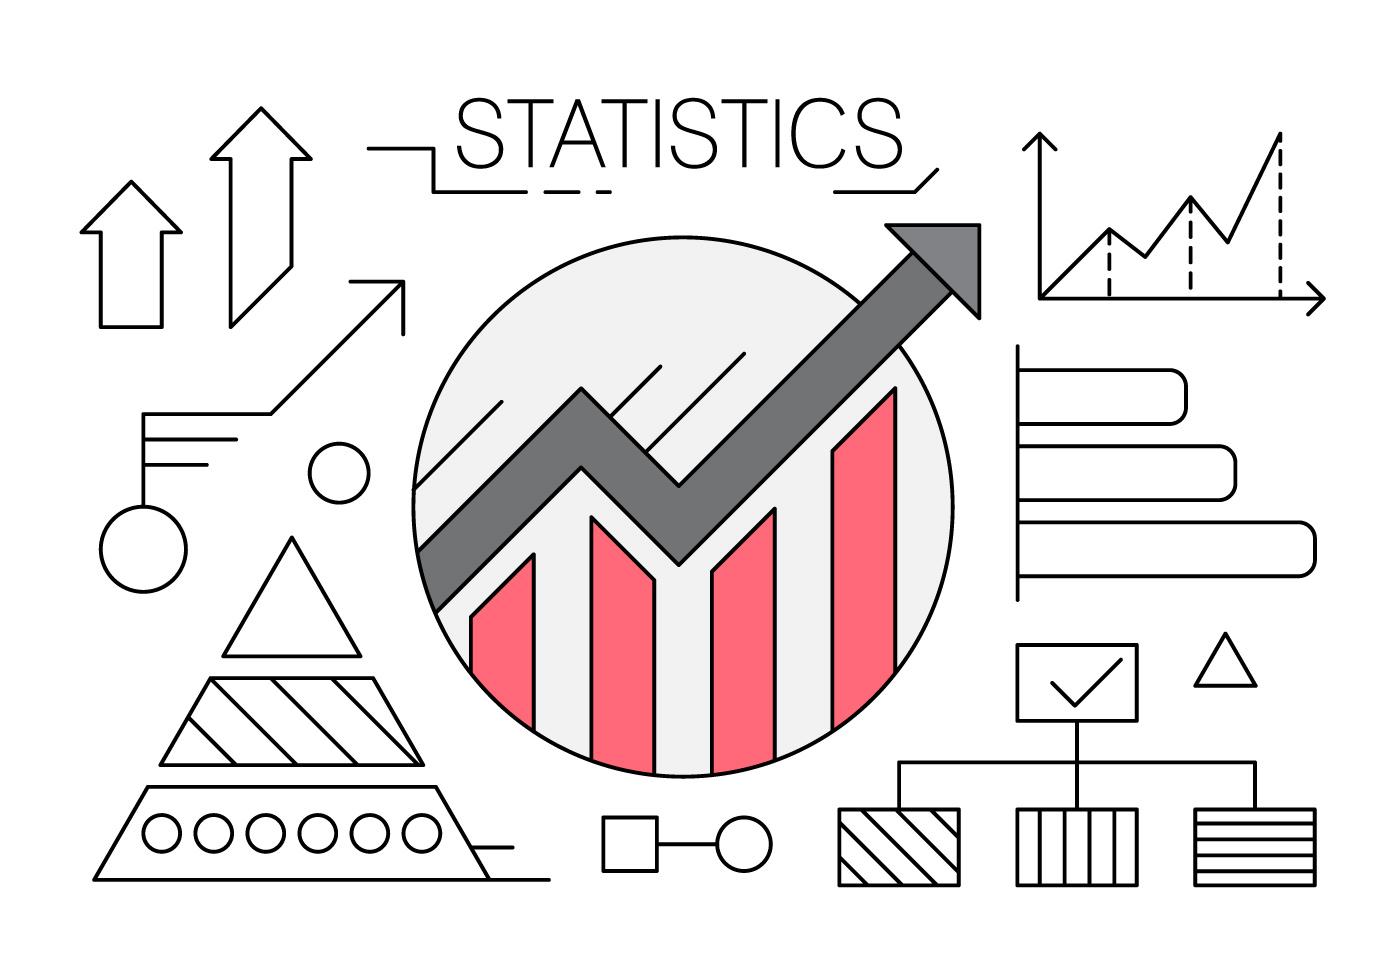 linear icons with charts and statistics vector - سورس مدیریت گروه پیشرفته و کامل پینگو